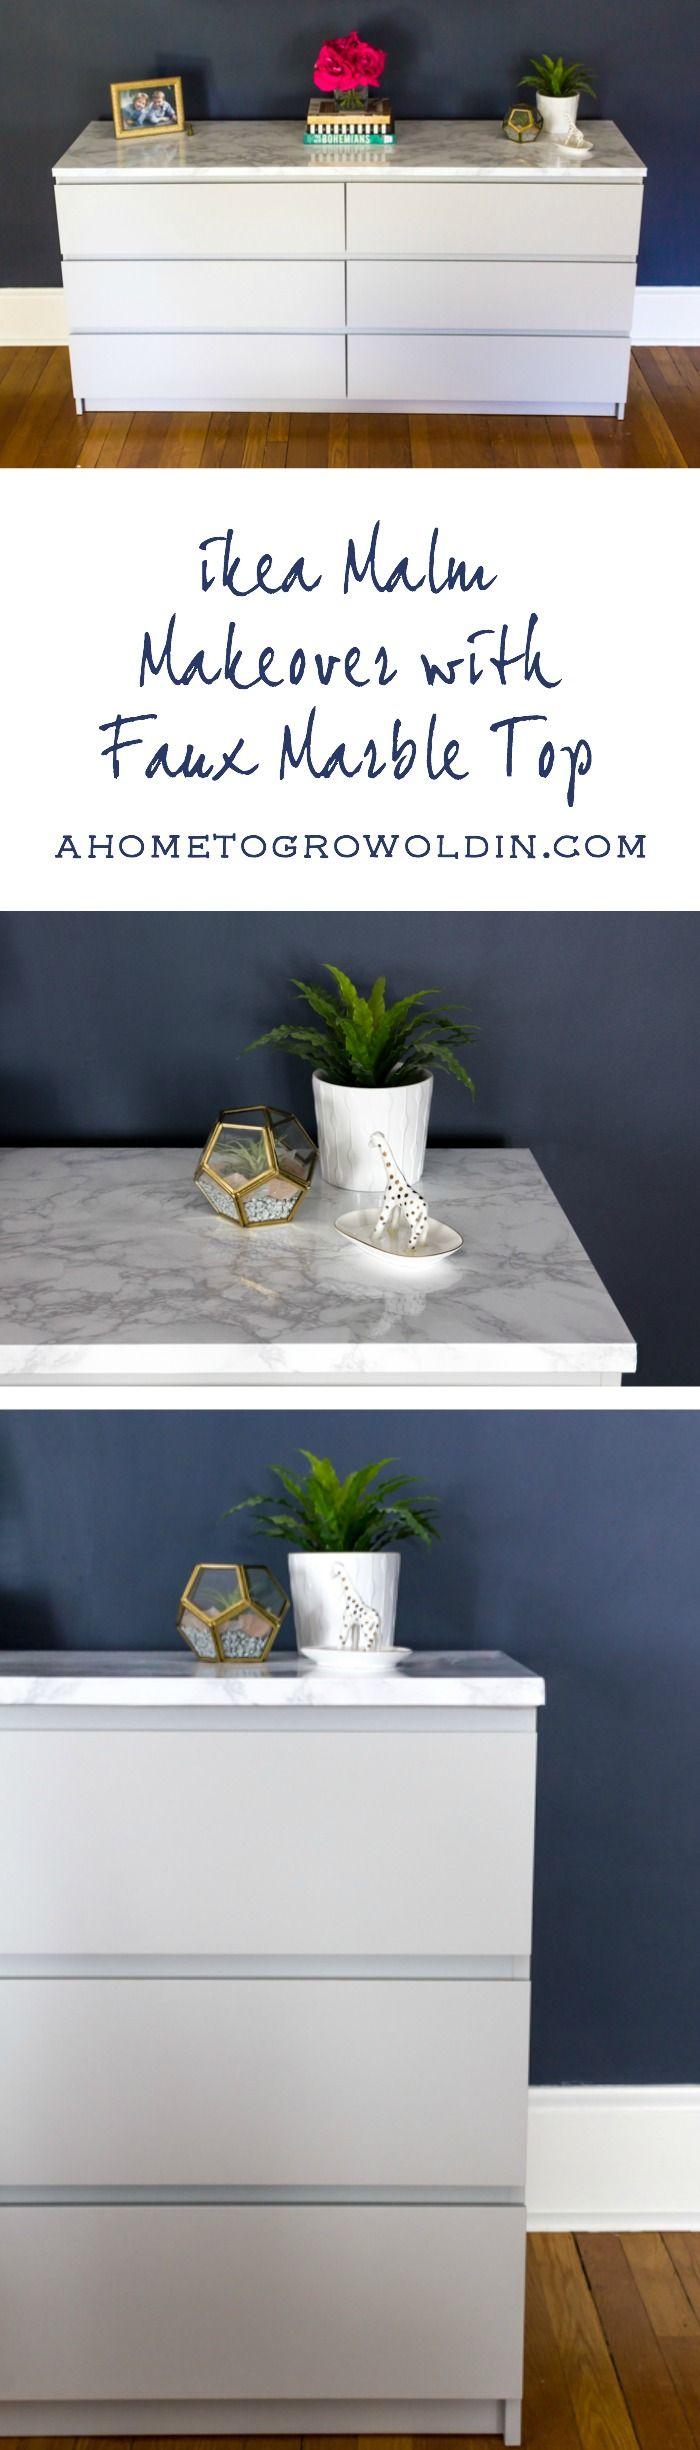 Painting Laminate Bedroom Furniture